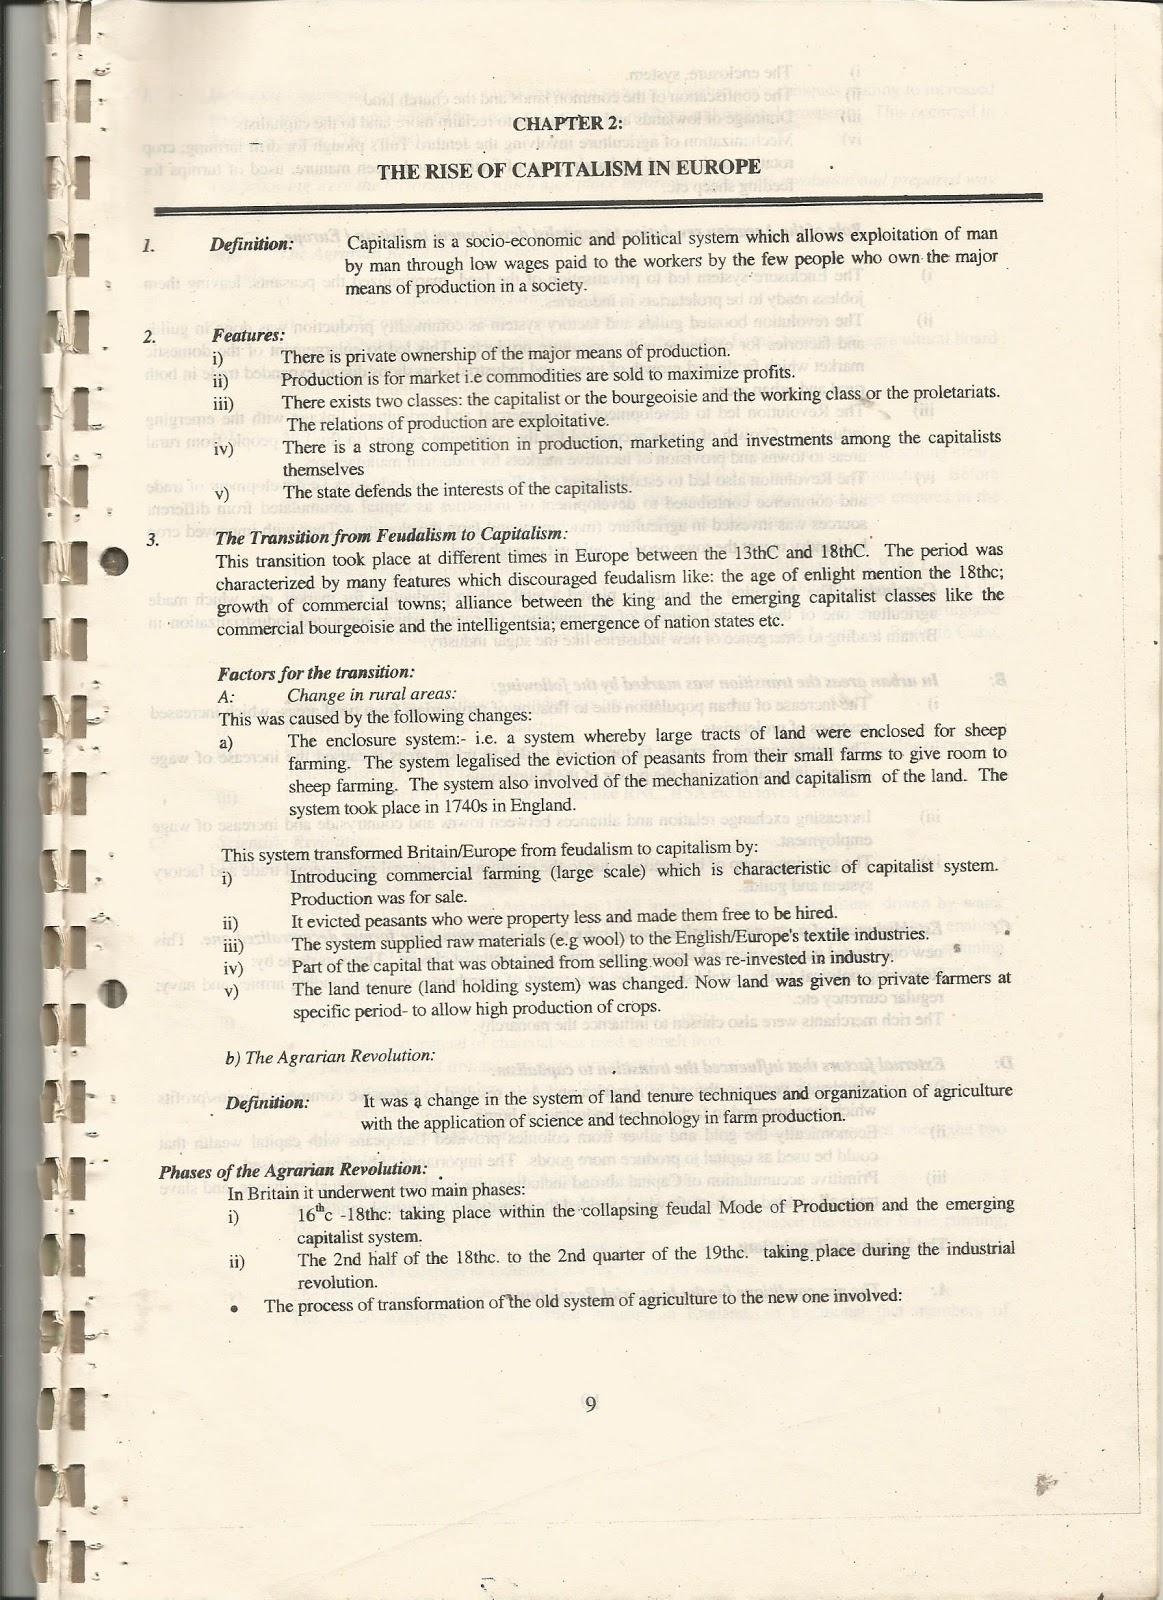 MWL JAPHET MASATU BLOG: HISTORY PAPER II -- THE RISE OF